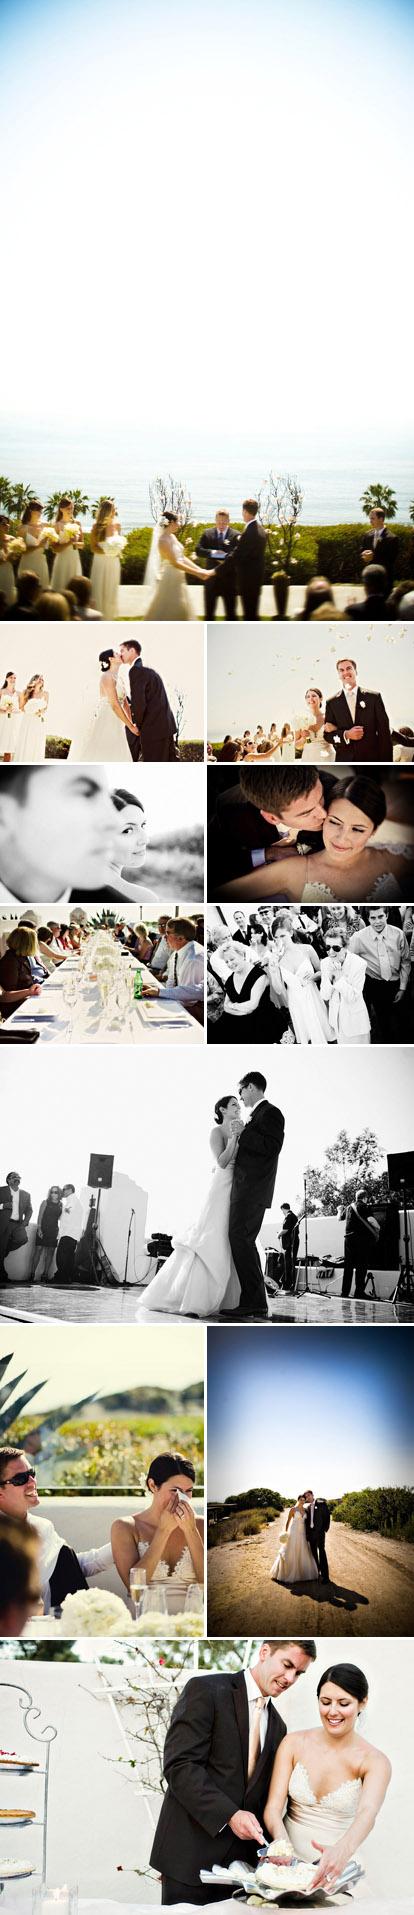 Outdoor California Real Wedding and wedding reception, alternative wedding cake, Amelia Lyon Photography